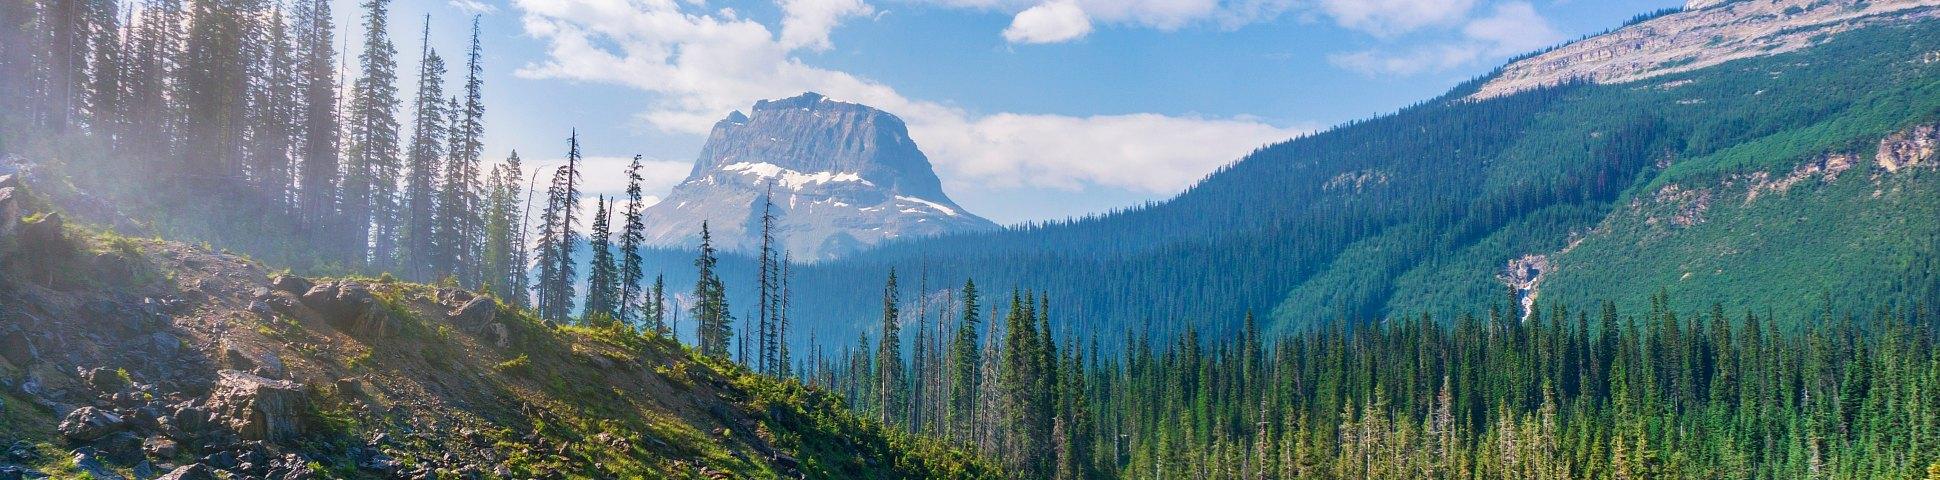 Canadian Rockies, British Columbia